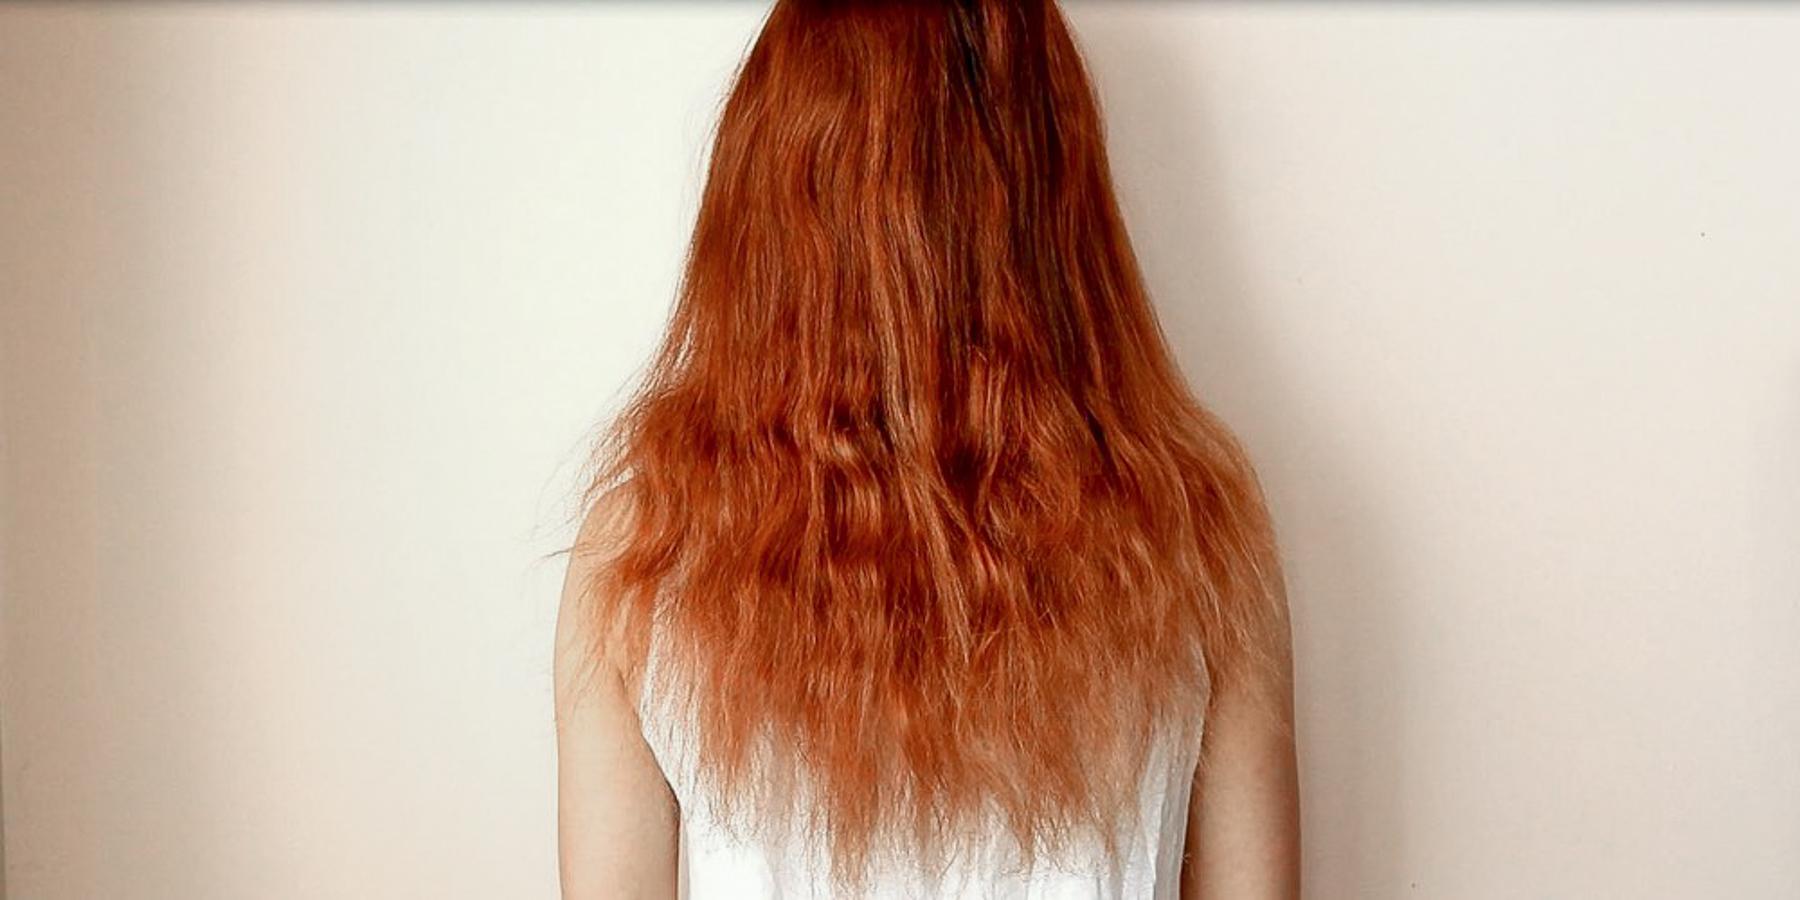 before Olaplex treatment showing hair damage